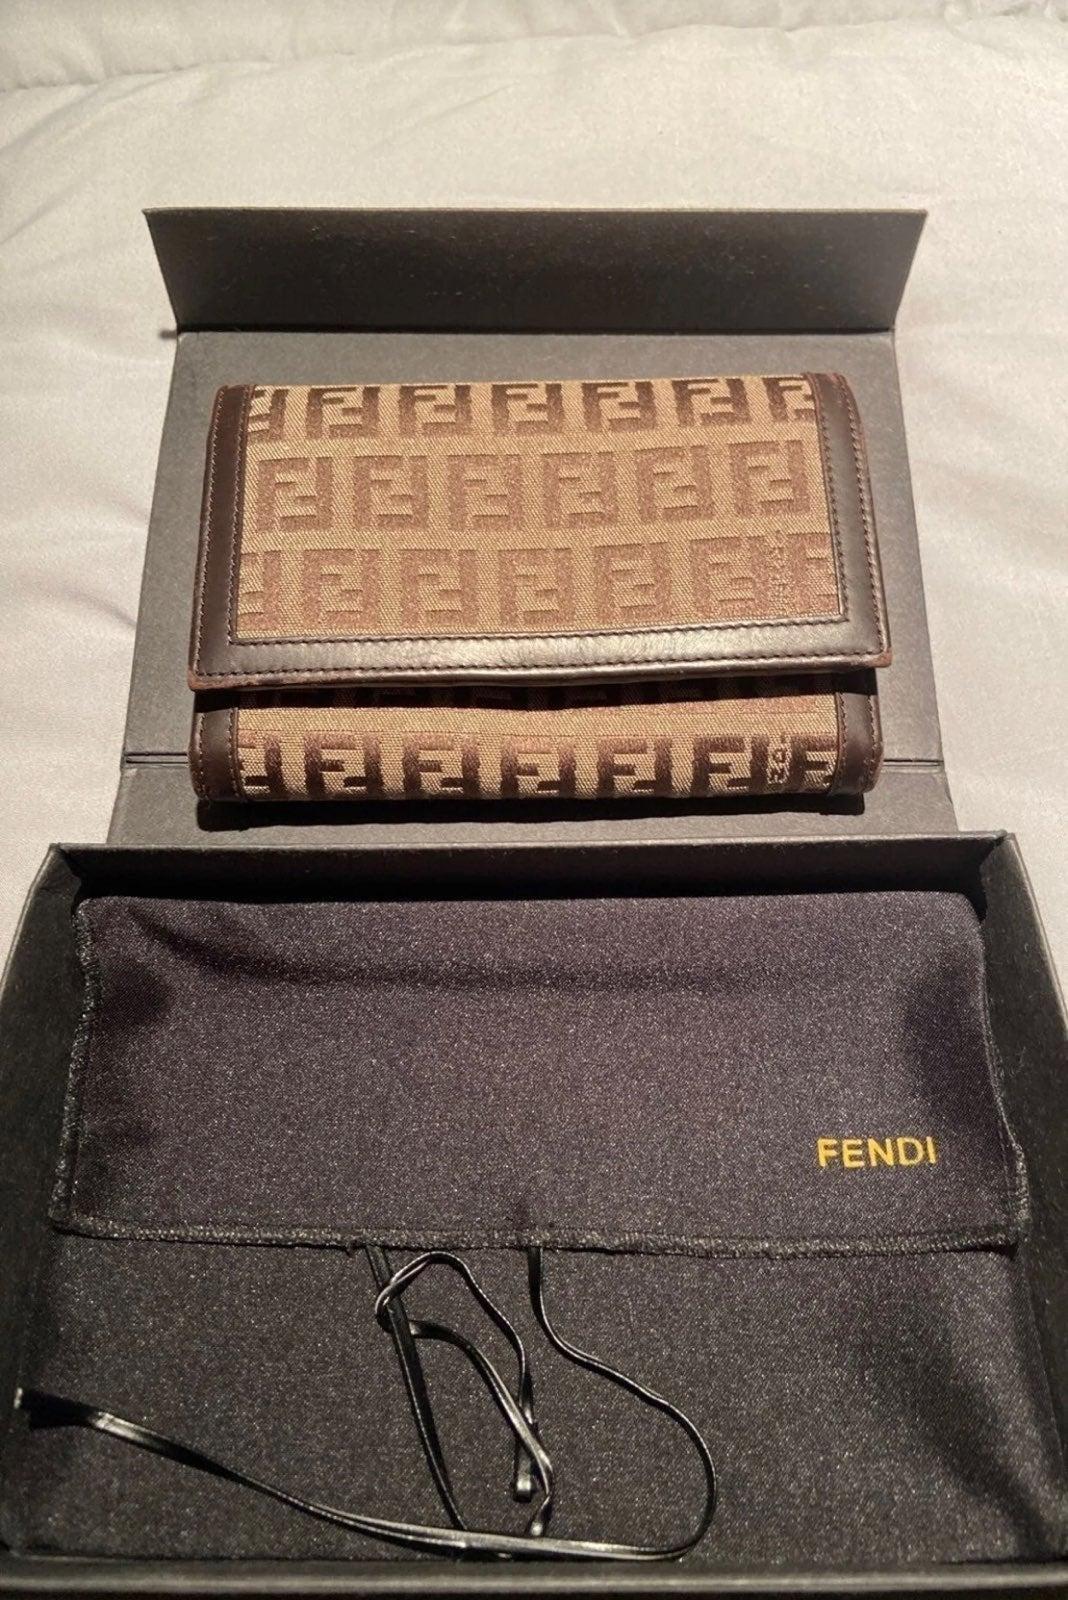 Fendi Wallet Bundle 4 Boo2